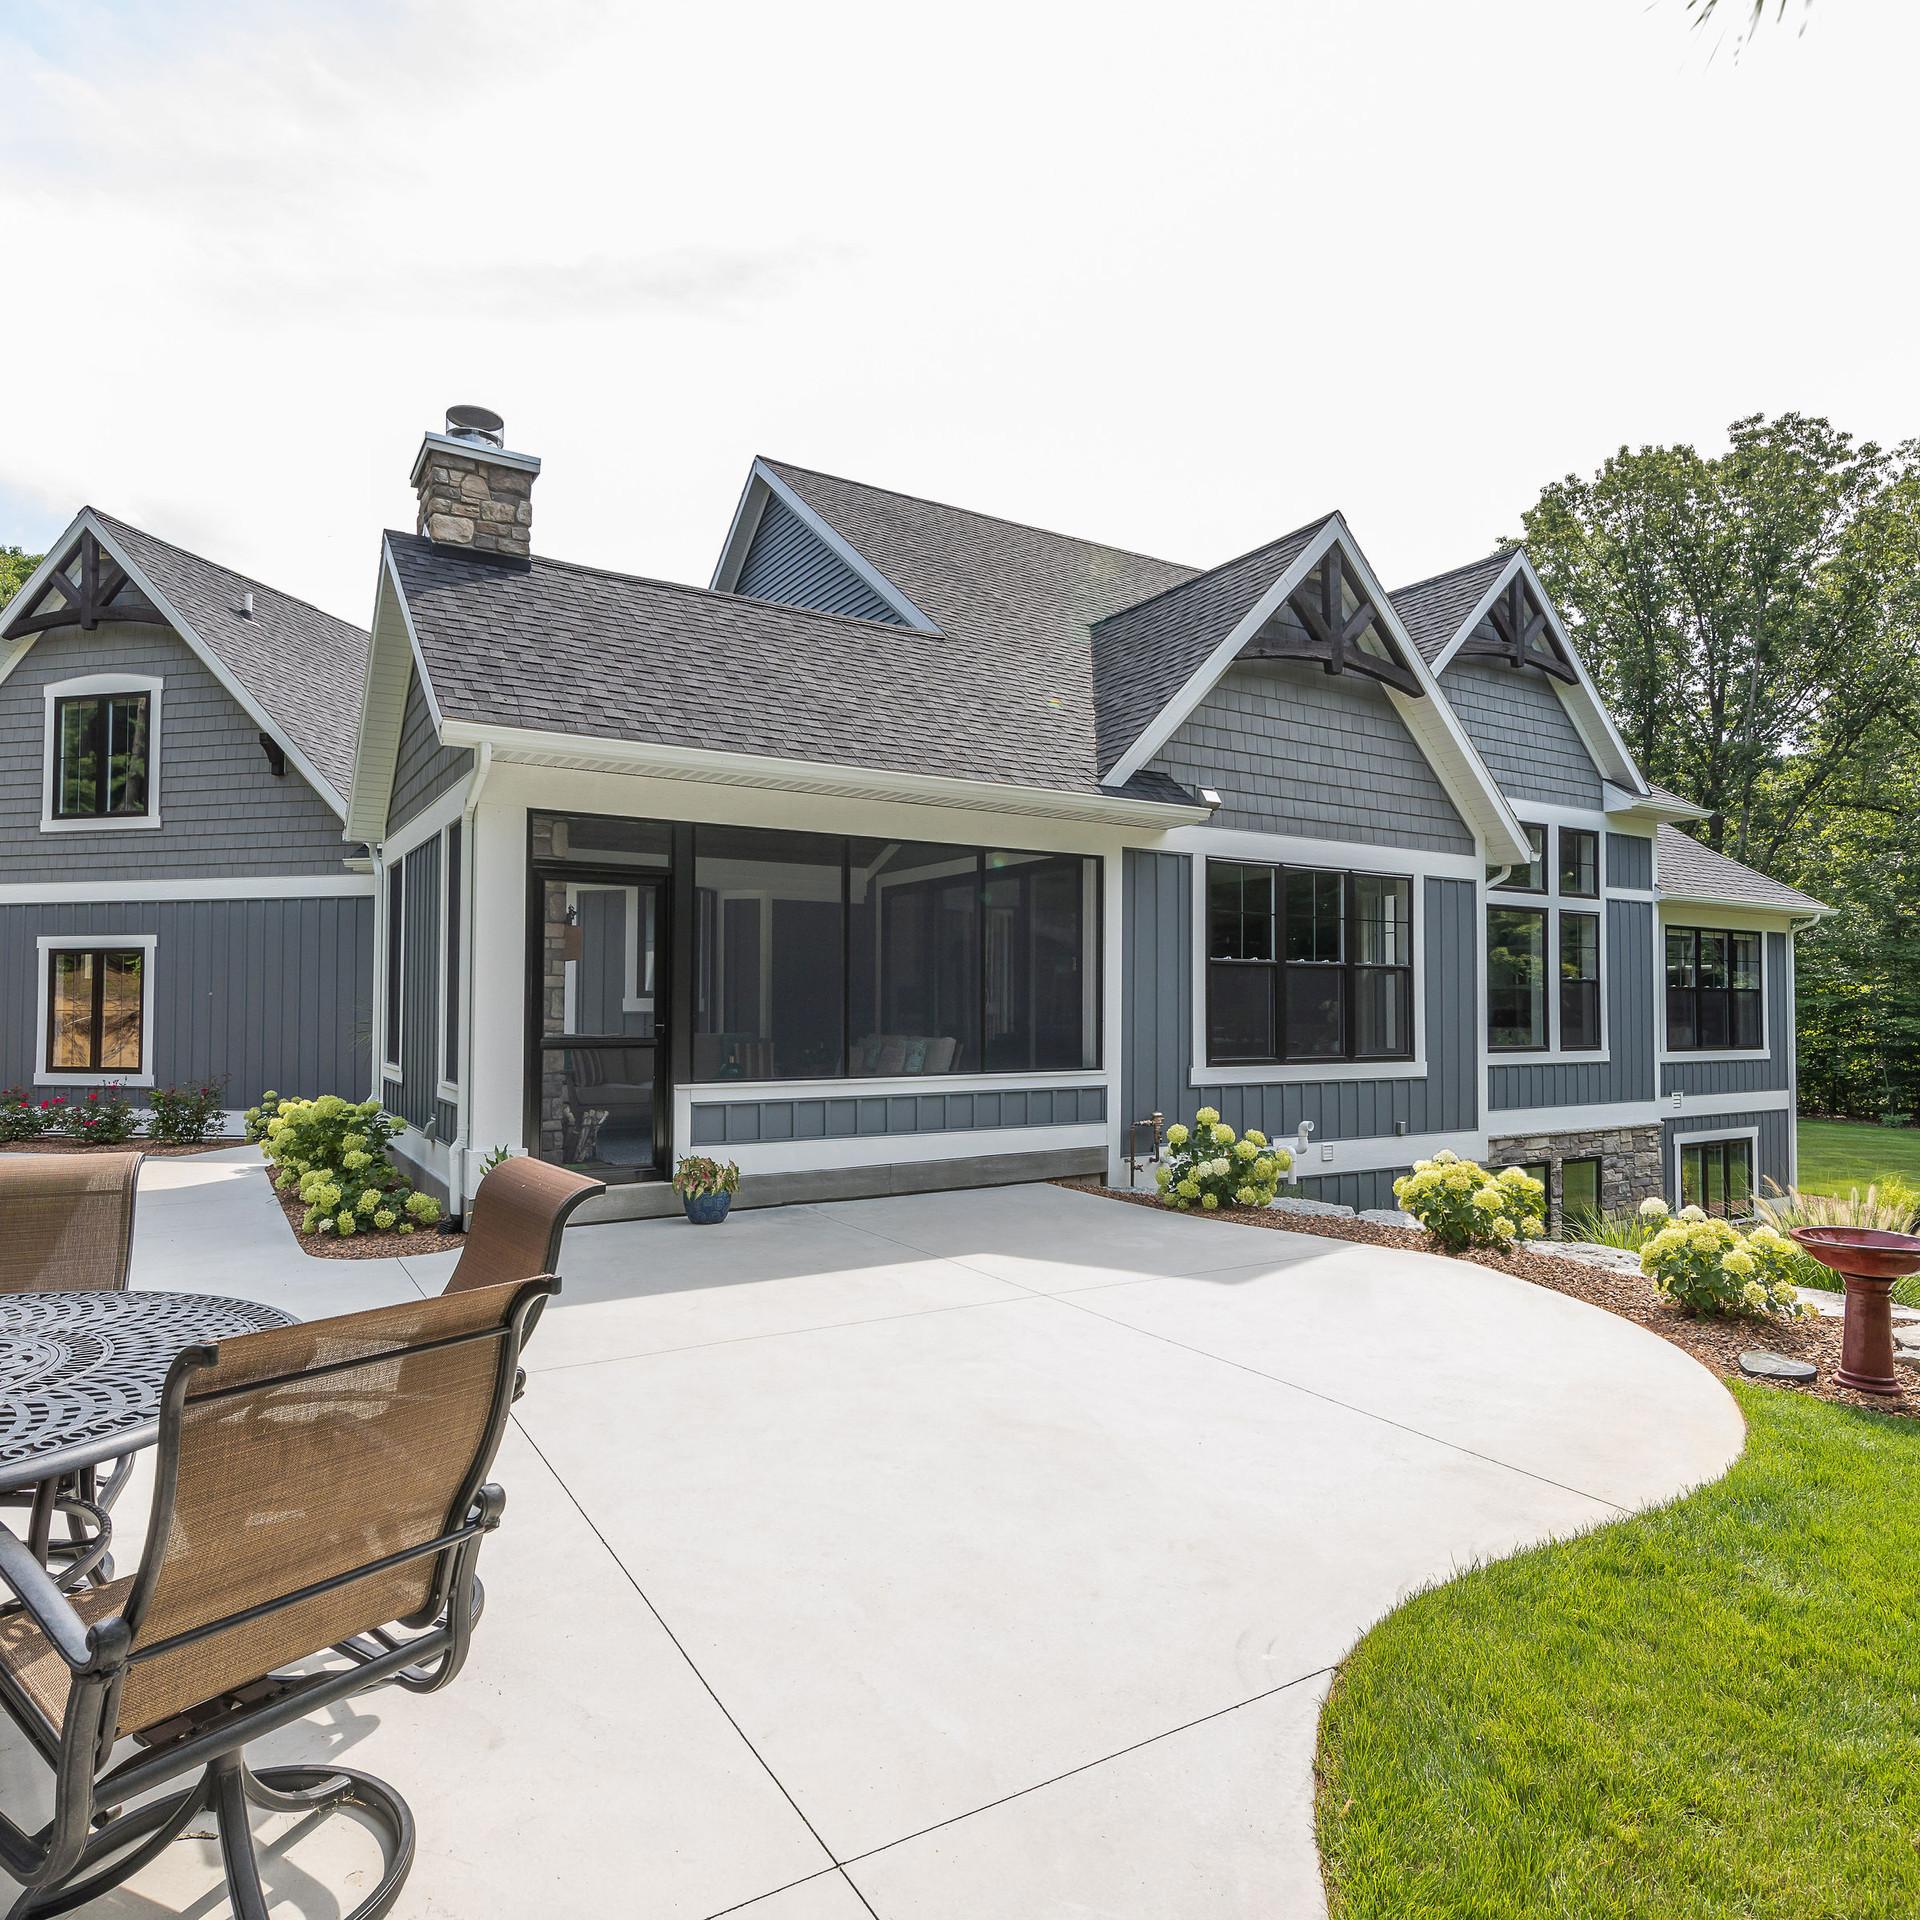 Outdoor Living Patio & Porch